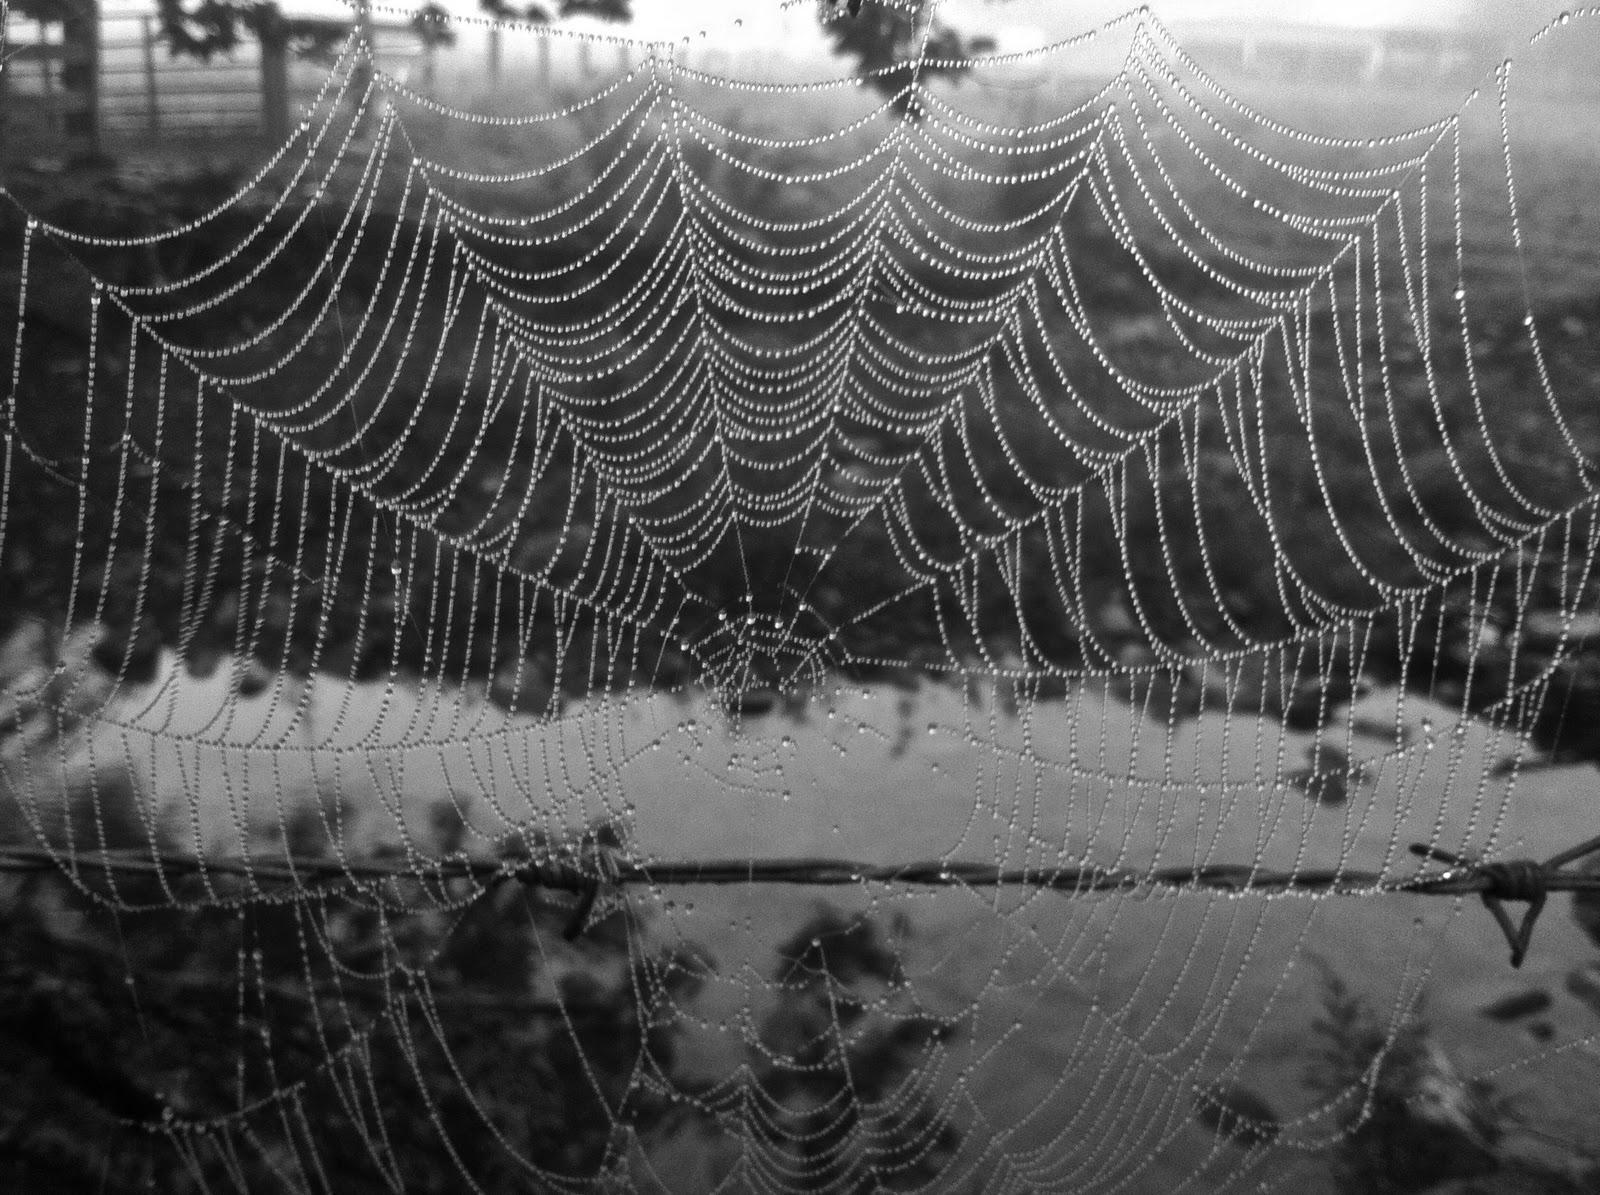 Spider Web Or Christmas Lights 9 16 11